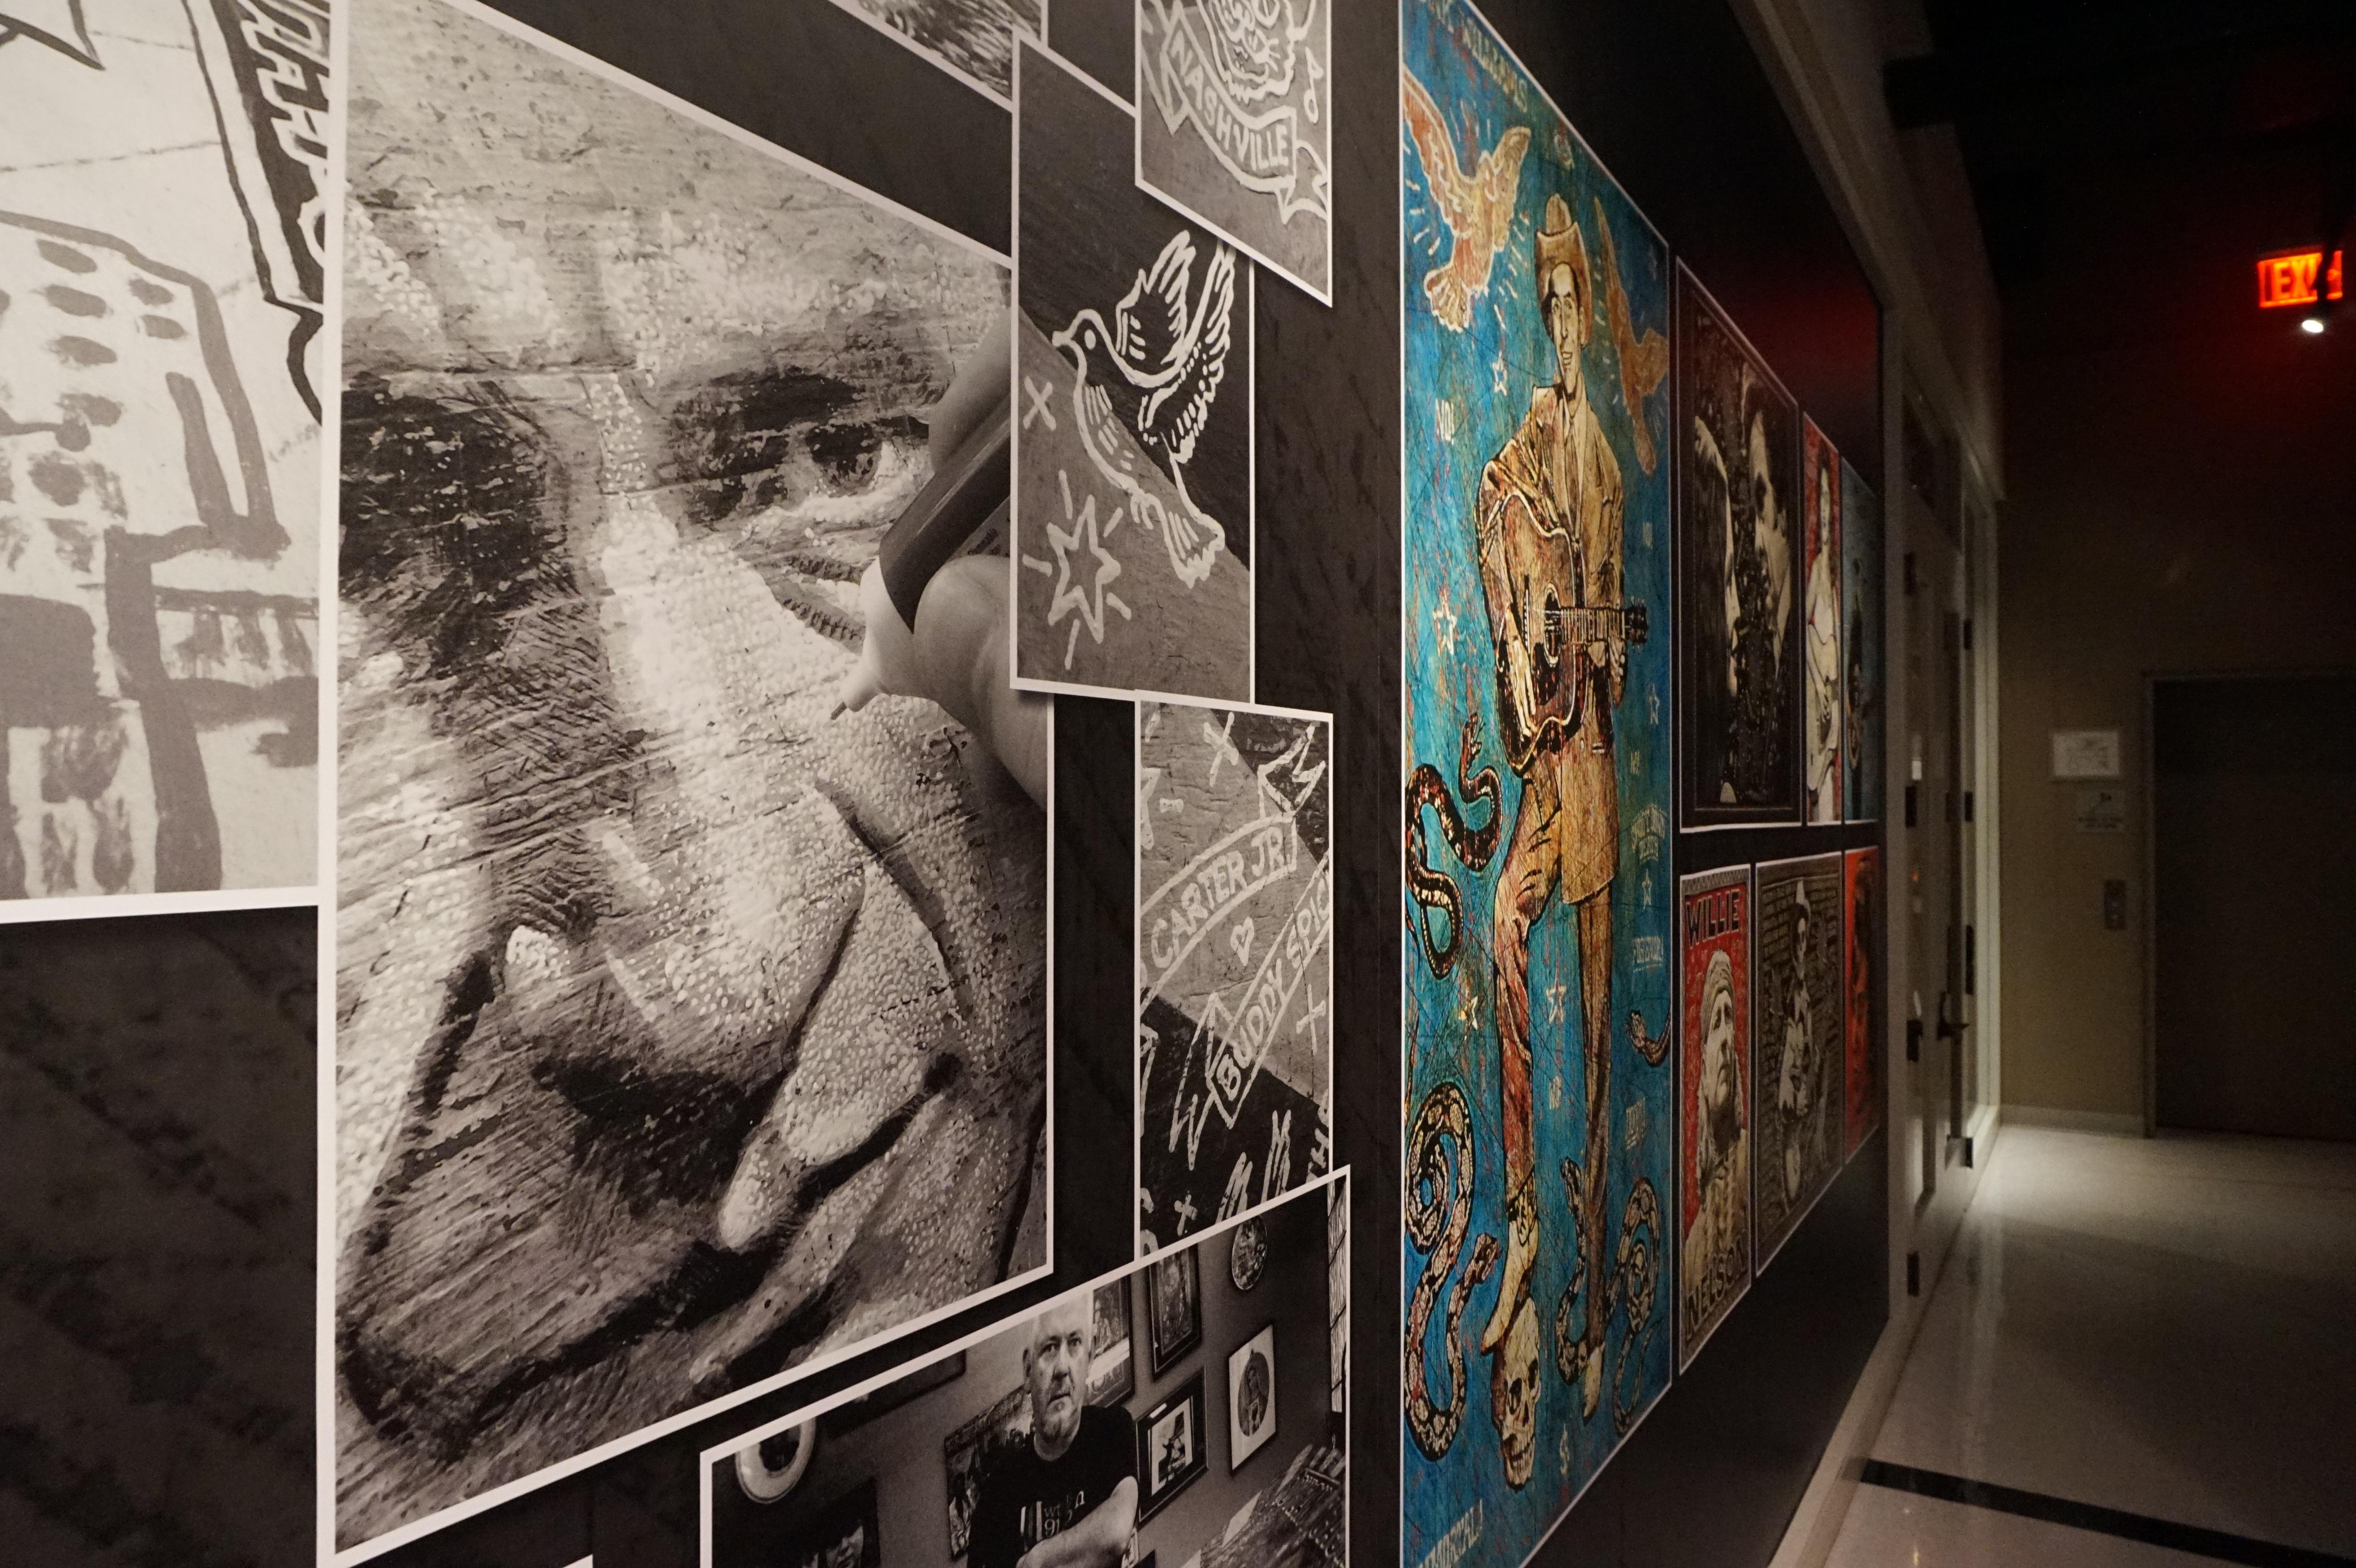 Modern Architecture Nashville Tn free images : wall, color, tourism, tourist attraction, nashville